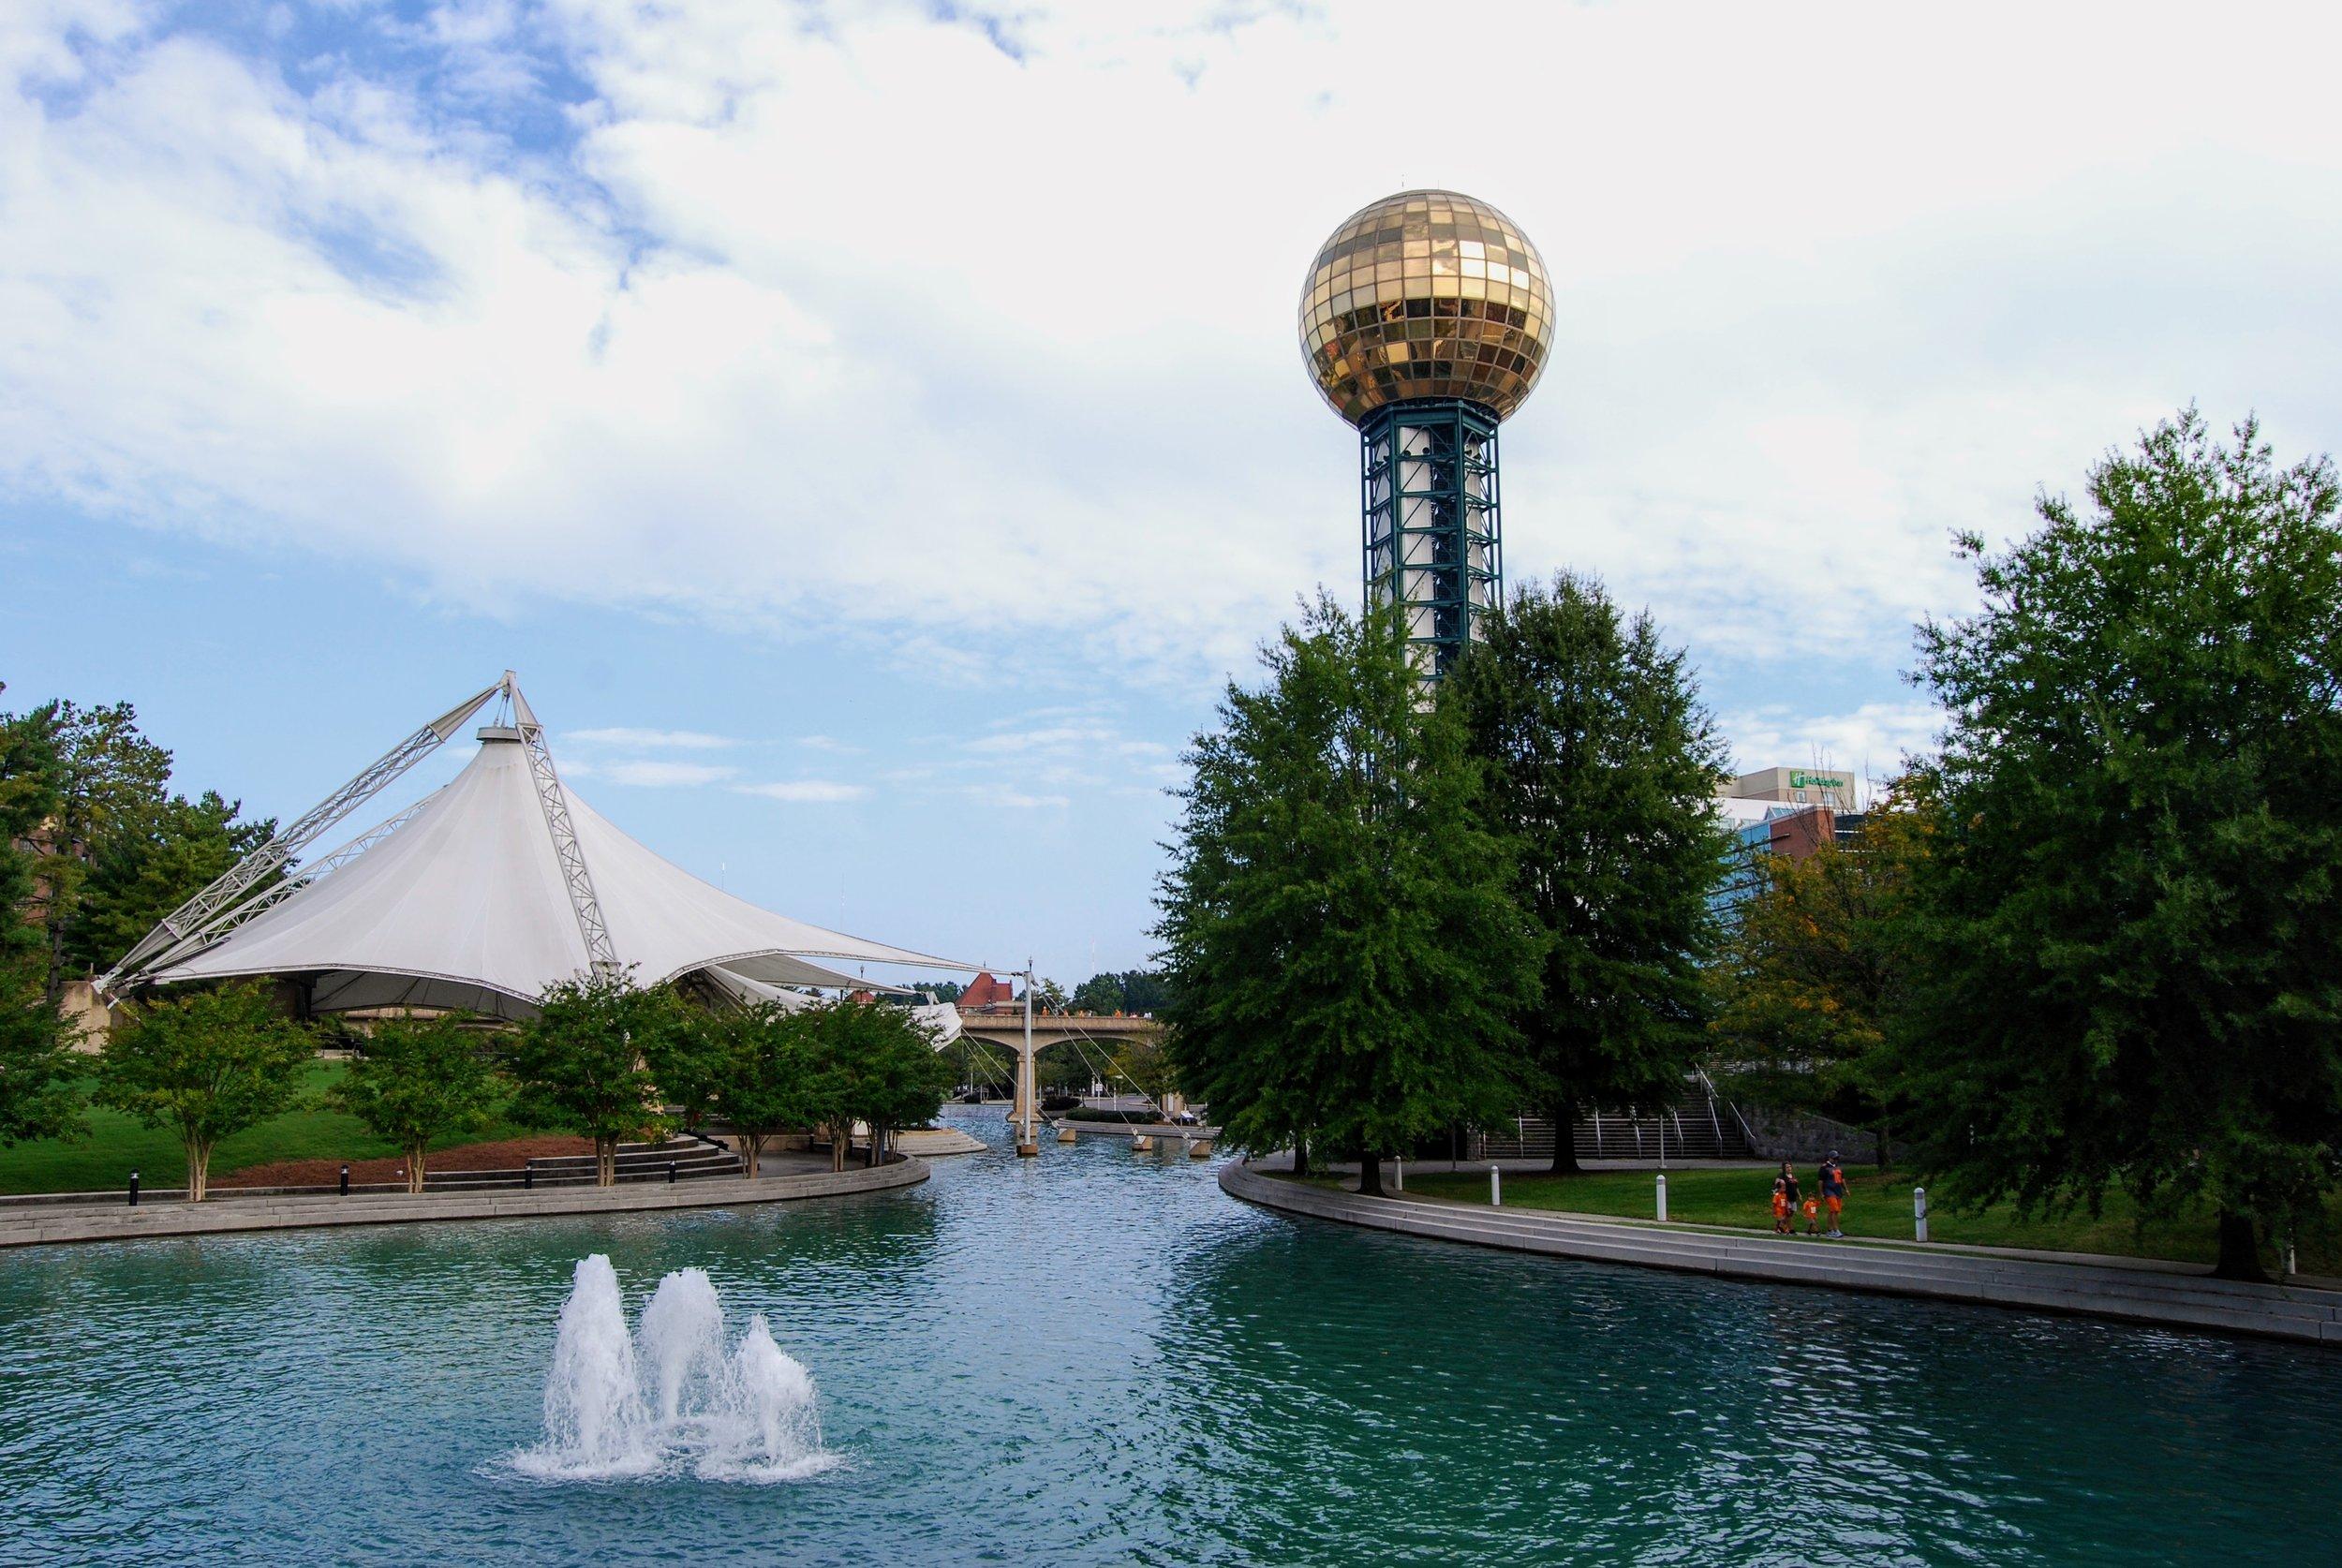 Sunsphere and the World's Fair Park